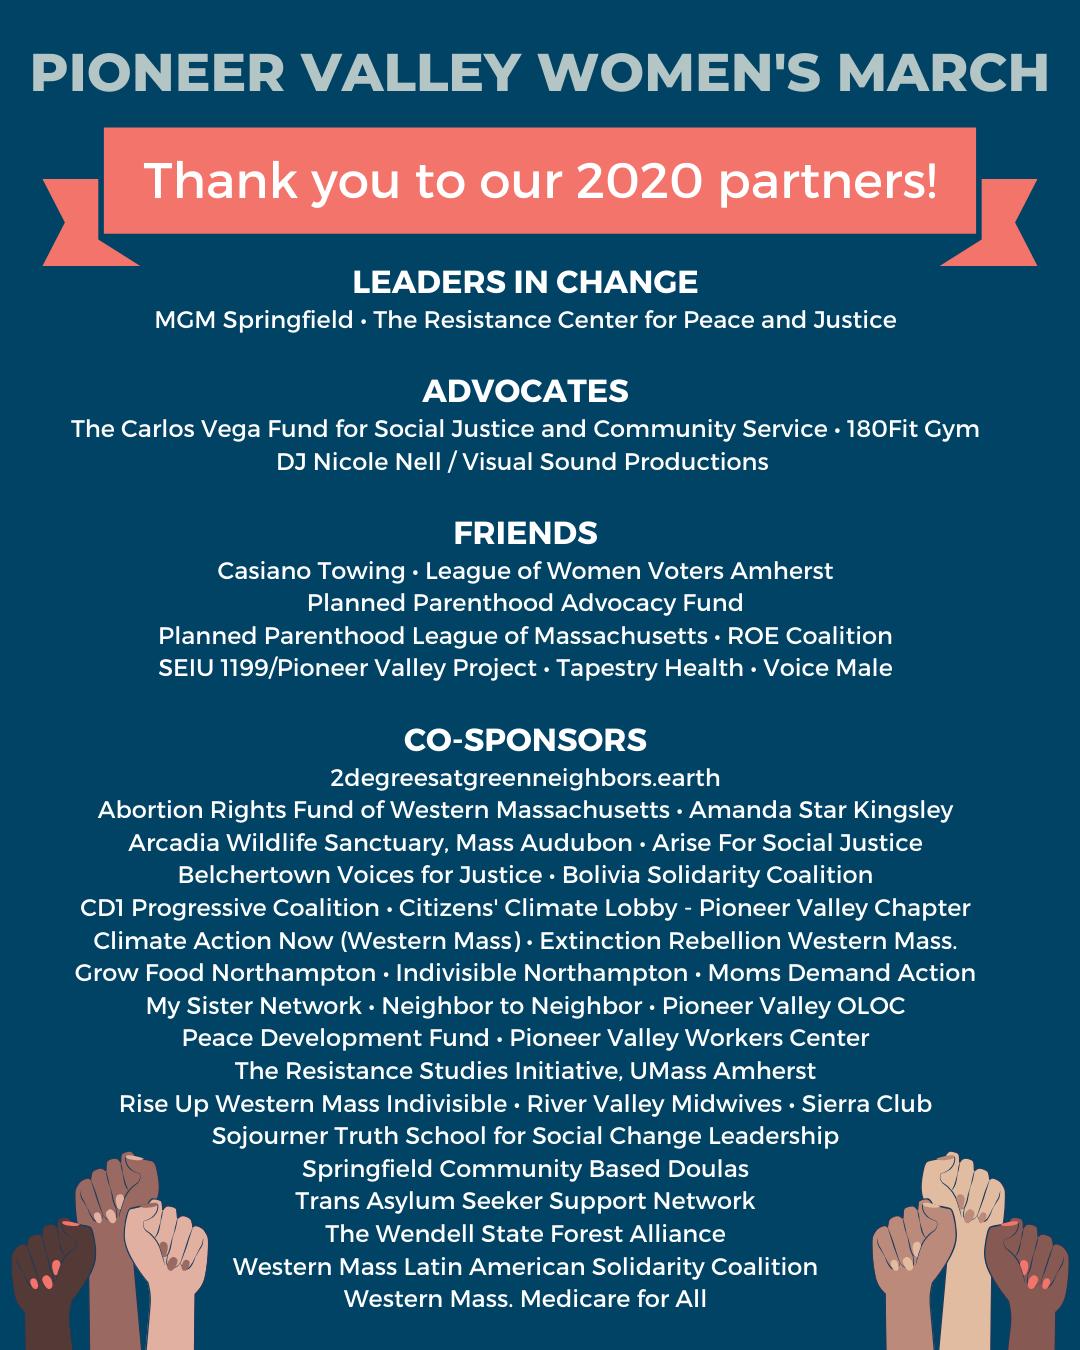 PVWM 2020 Partners